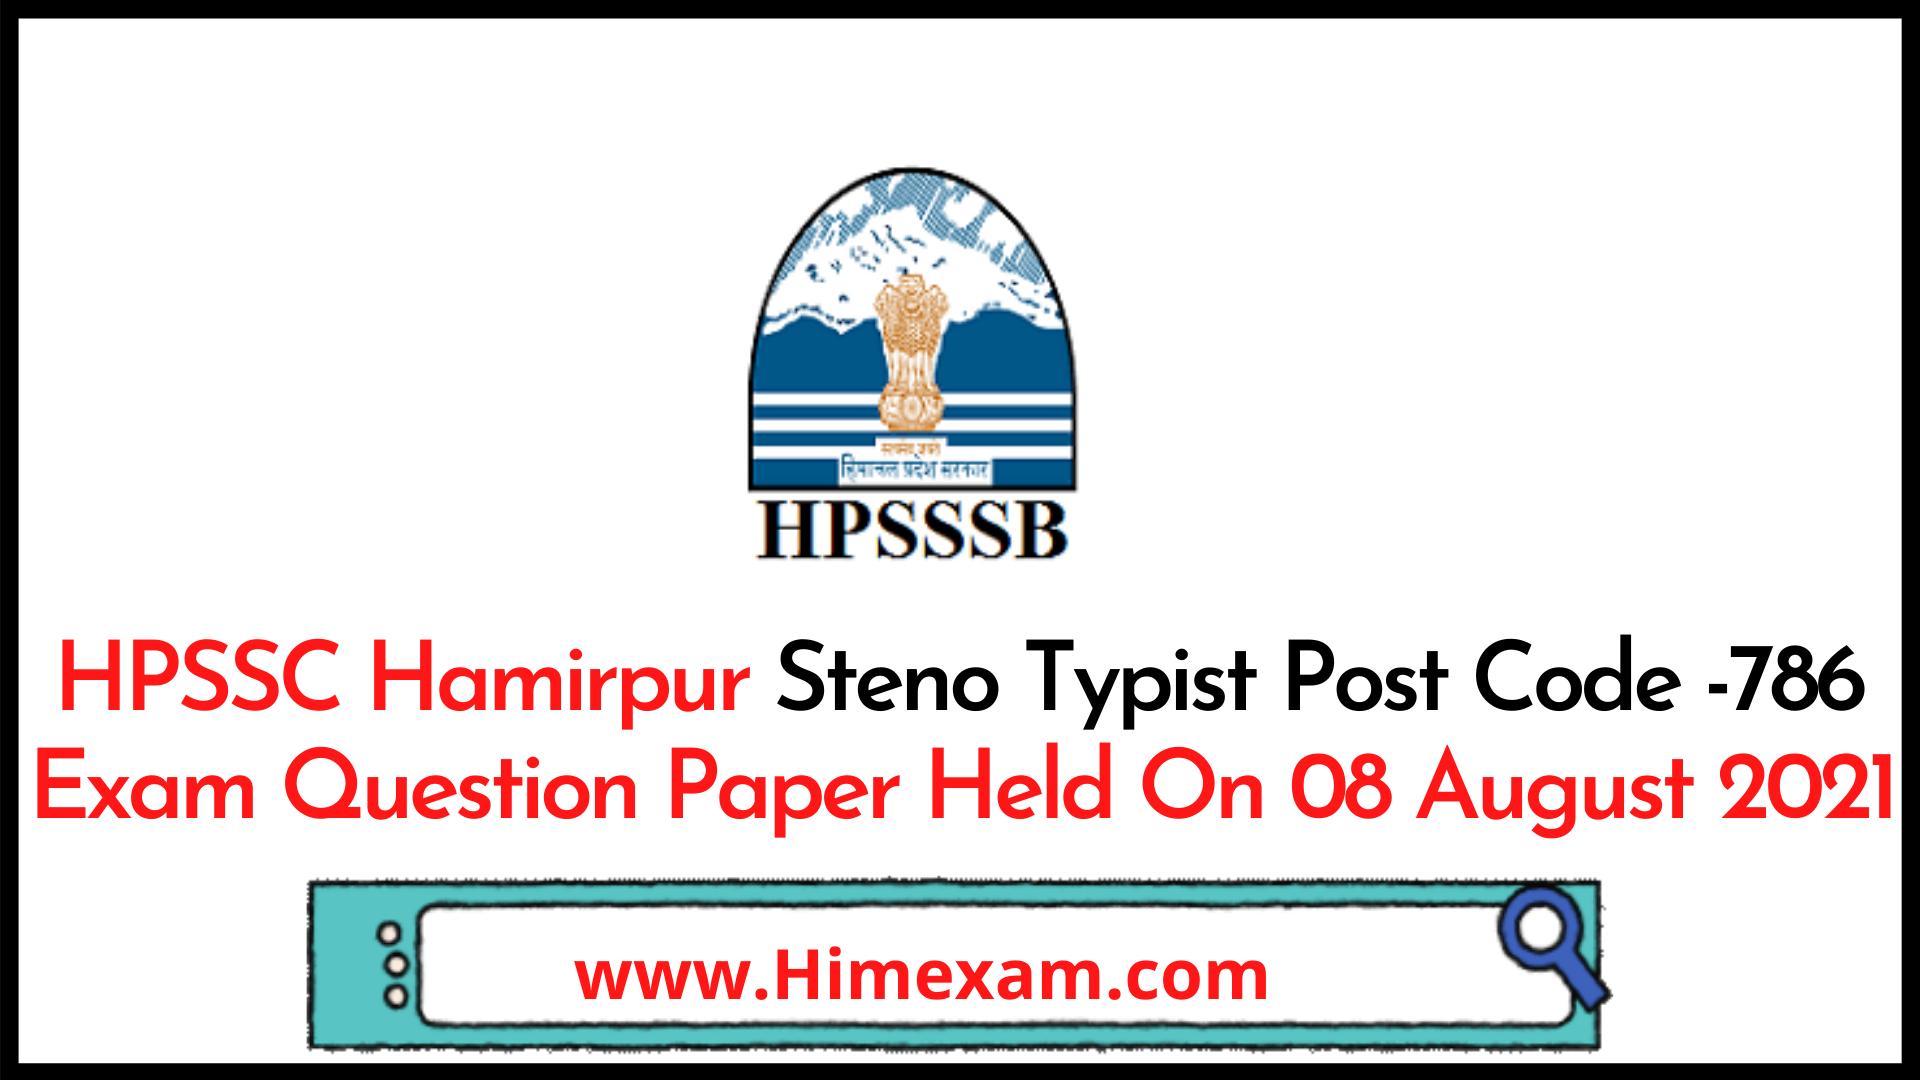 HPSSC Hamirpur Steno Typist  Post Code -786 Exam Question Paper Held On 08 August 2021